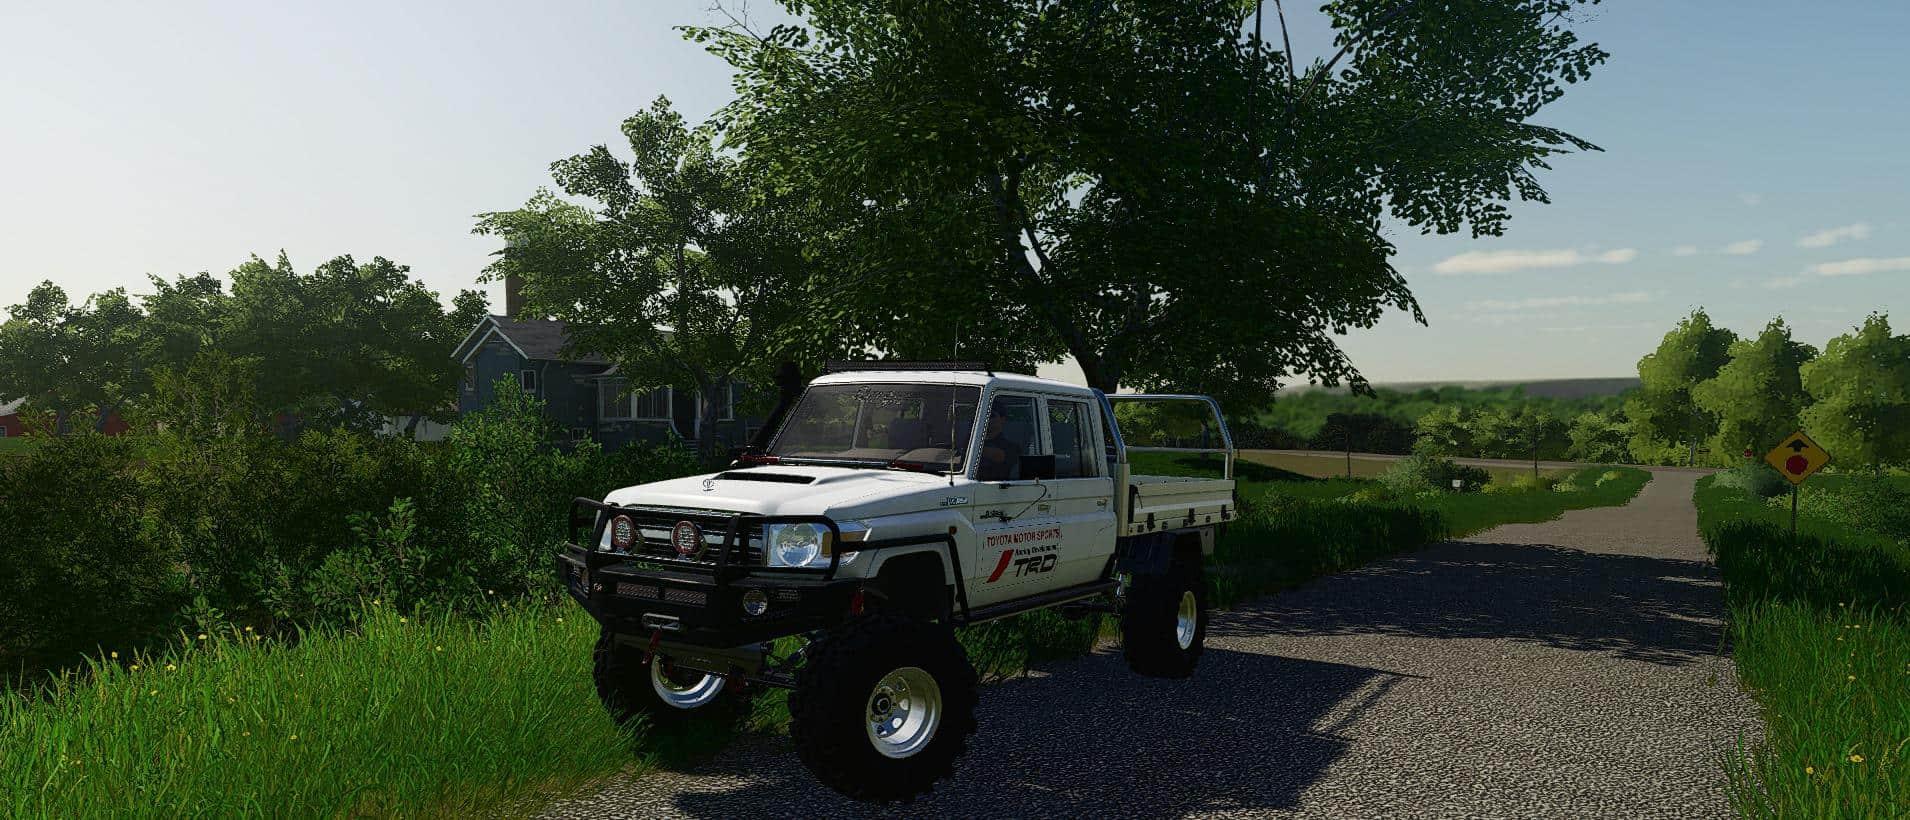 Toyota Land Cruiser 70 v1 0 Mod - Farming Simulator 19 Mod